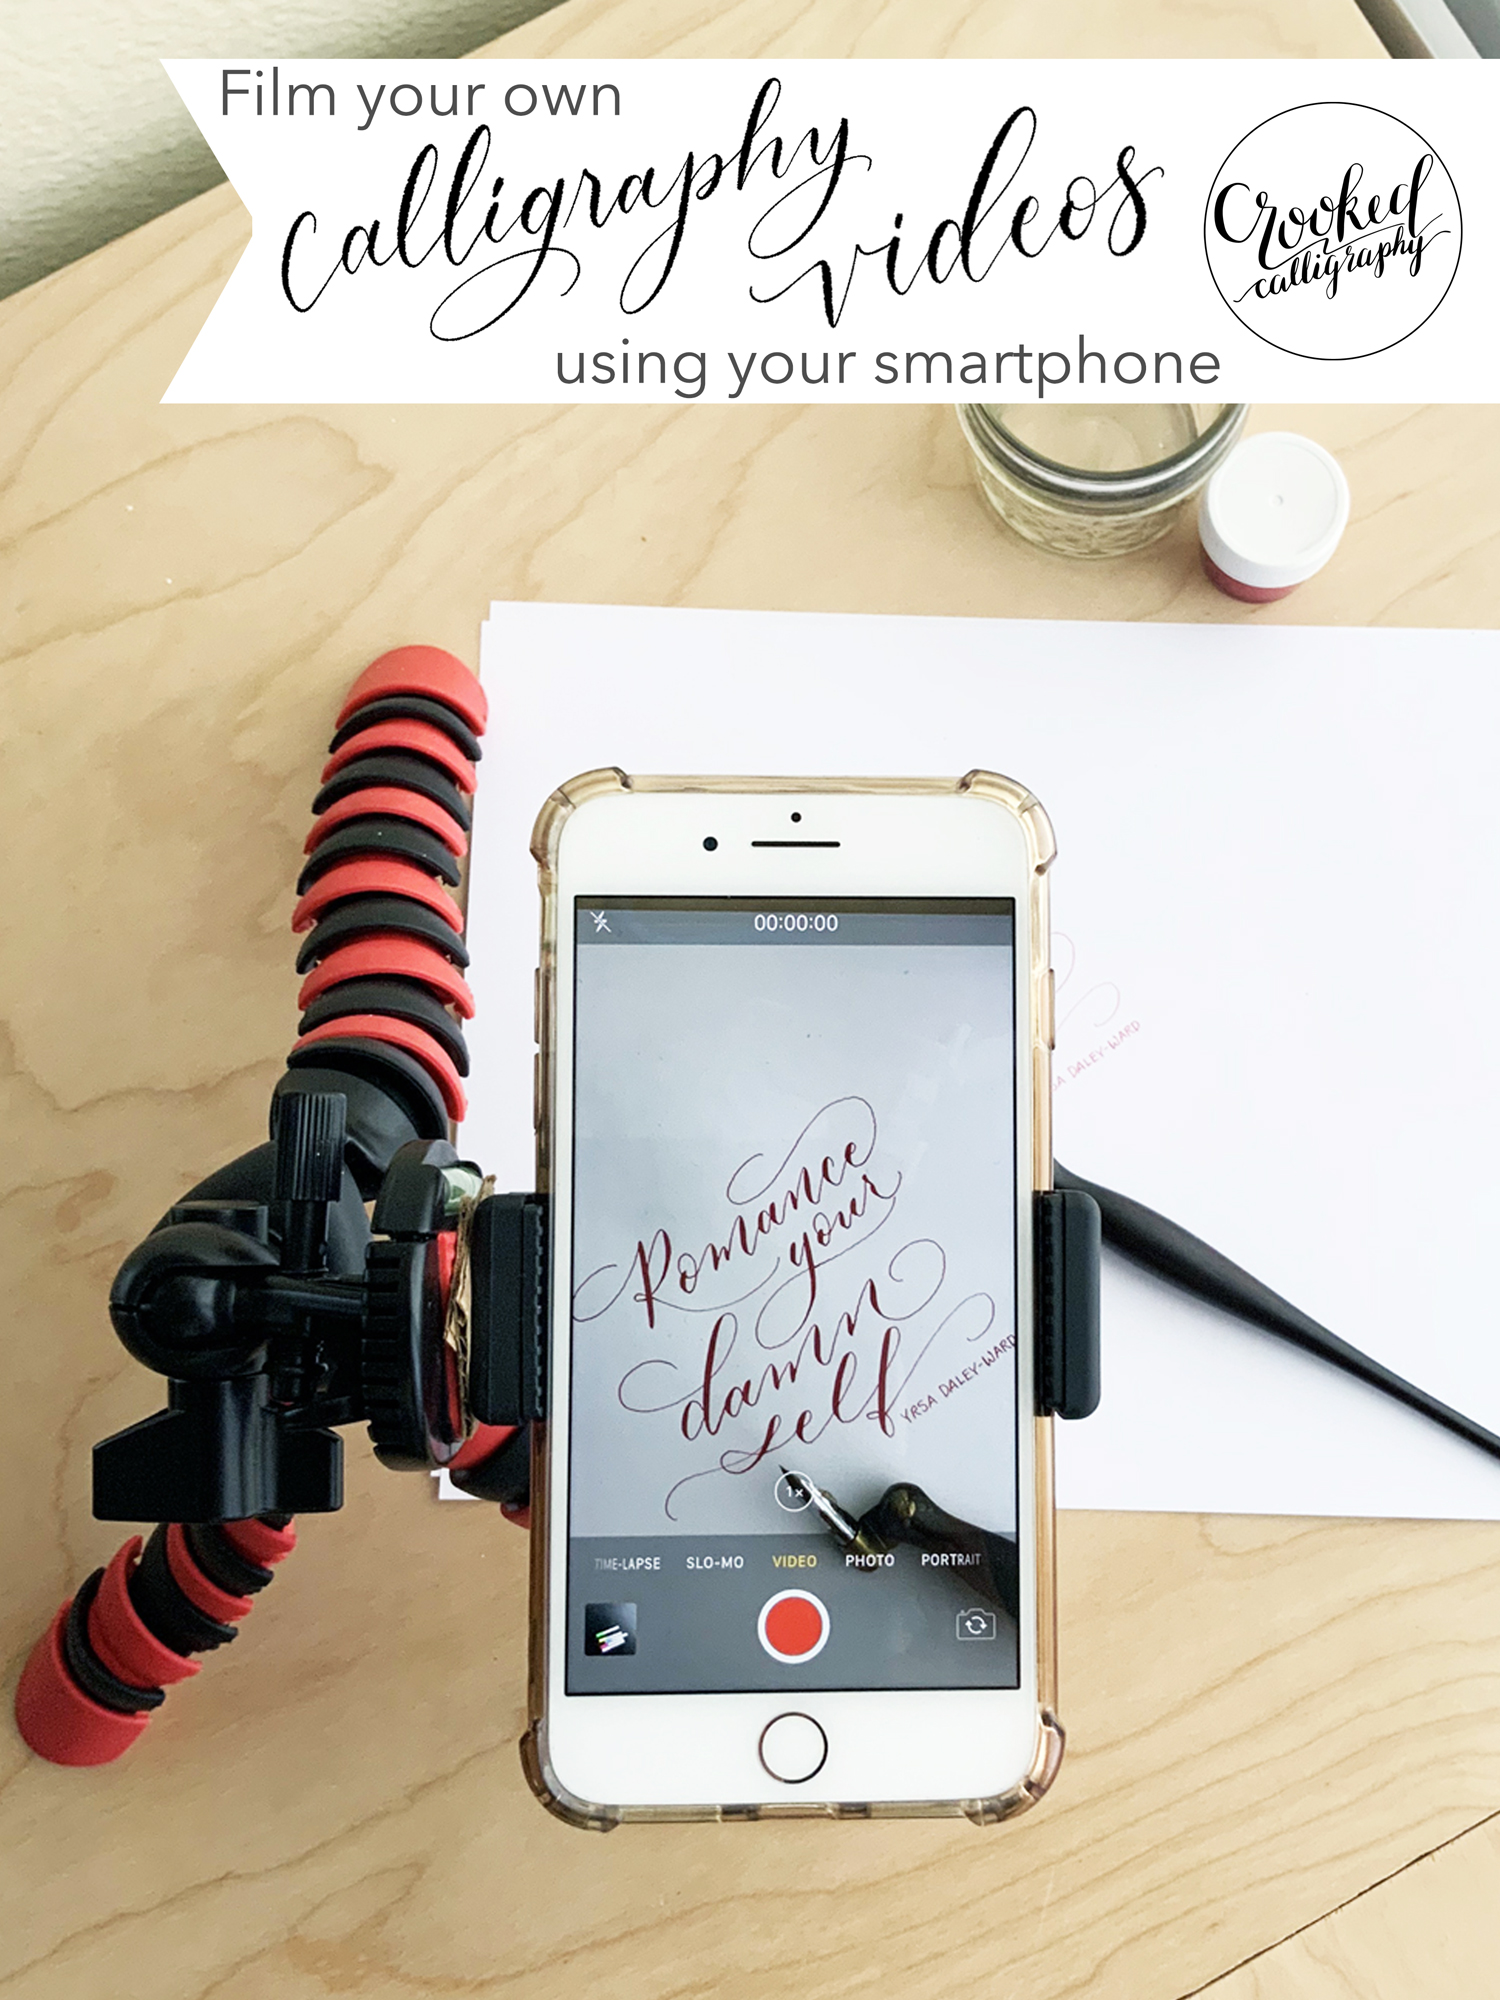 Filming-Calligraphy-Videos-Cover-Photos.jpg